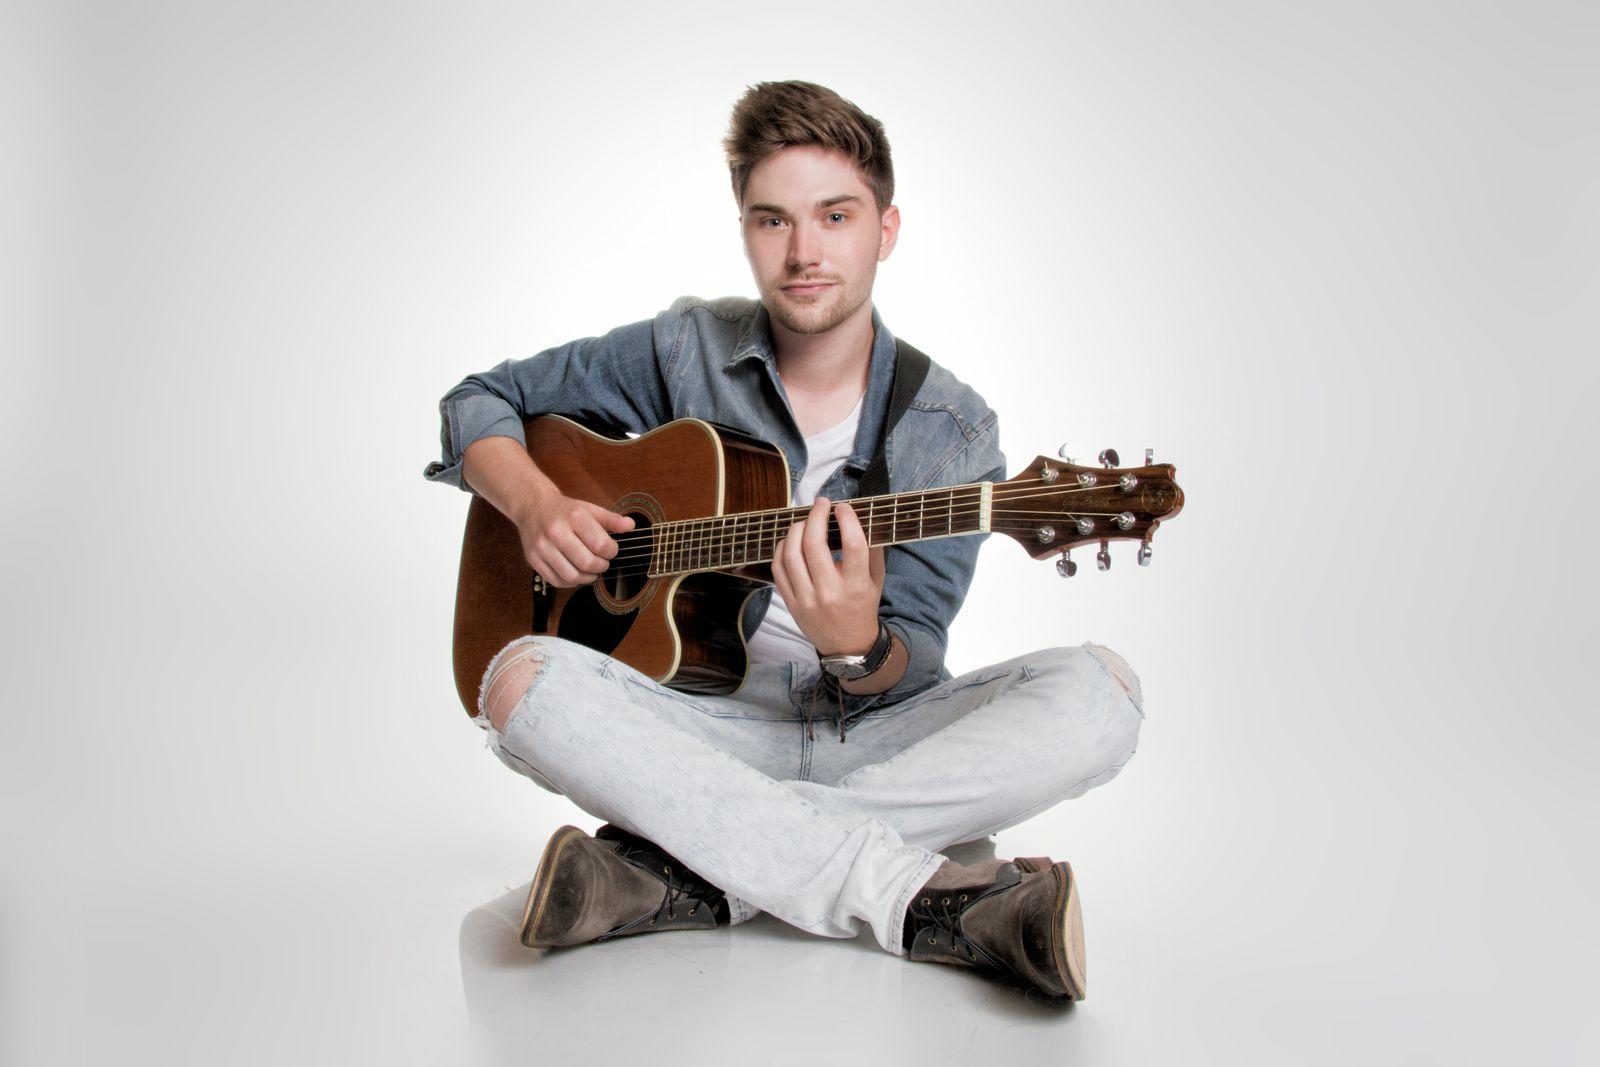 New Artist Tuesday - October 23 - Dustin Bird